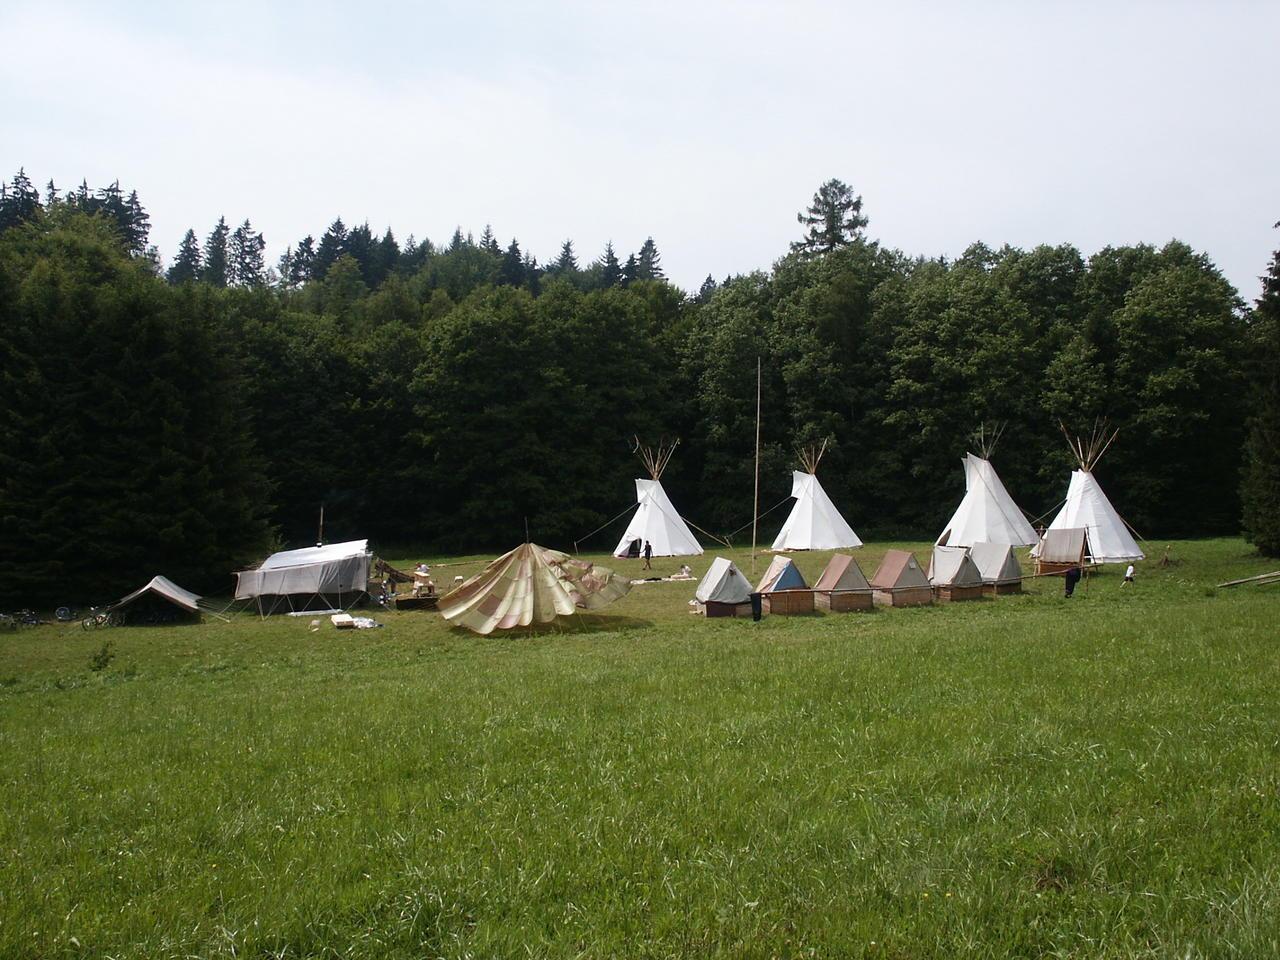 Tábor 2004 (1.7.2004 - 23.7.2004, Moráva)